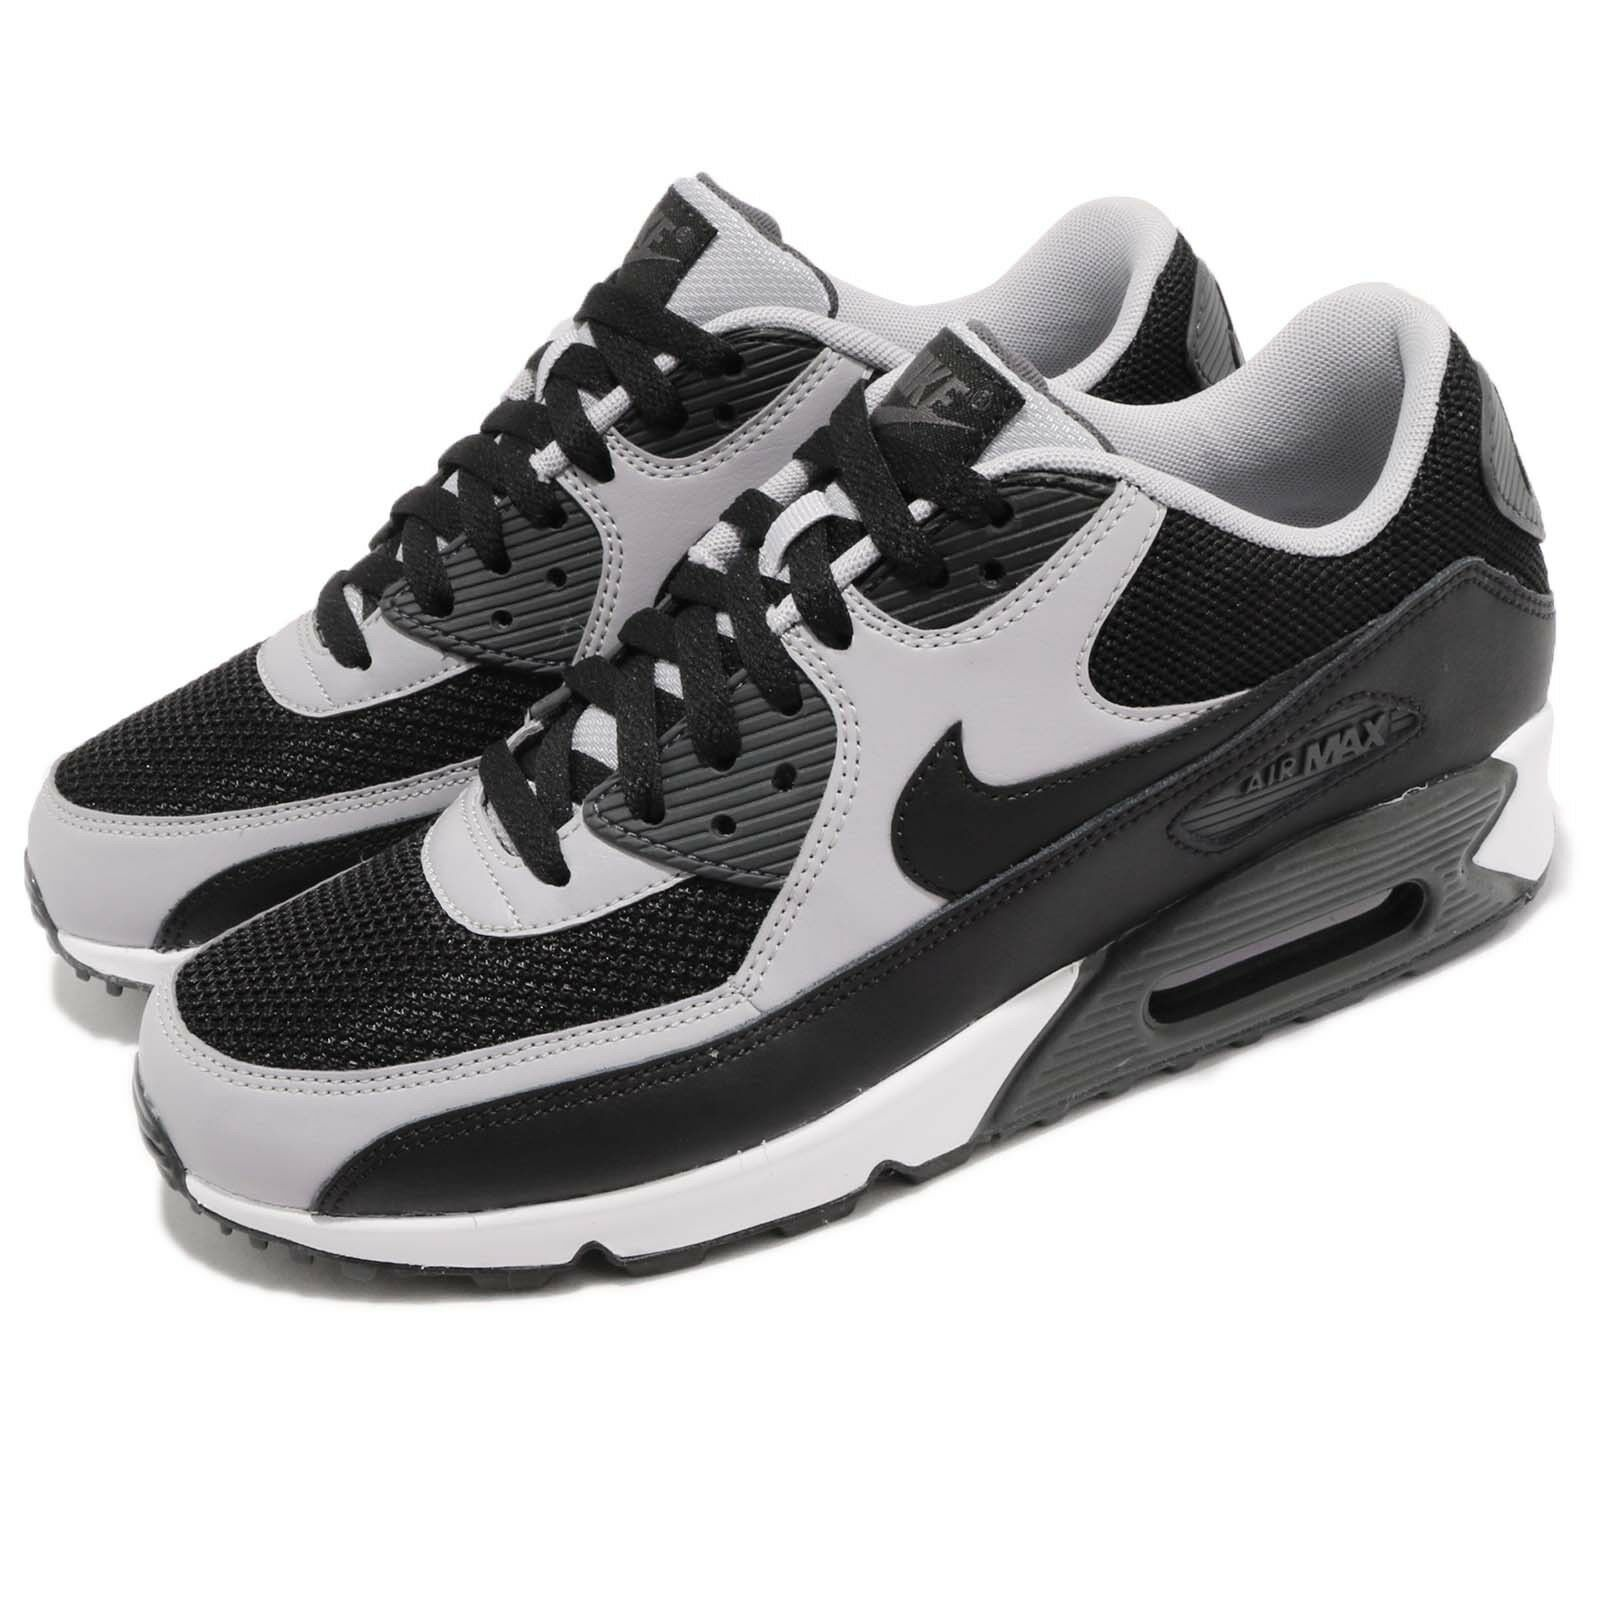 Nike Air Max 90 Essential Black Shoes Wolf Grey Mens Running Shoes Black 537384-053 03f8c7